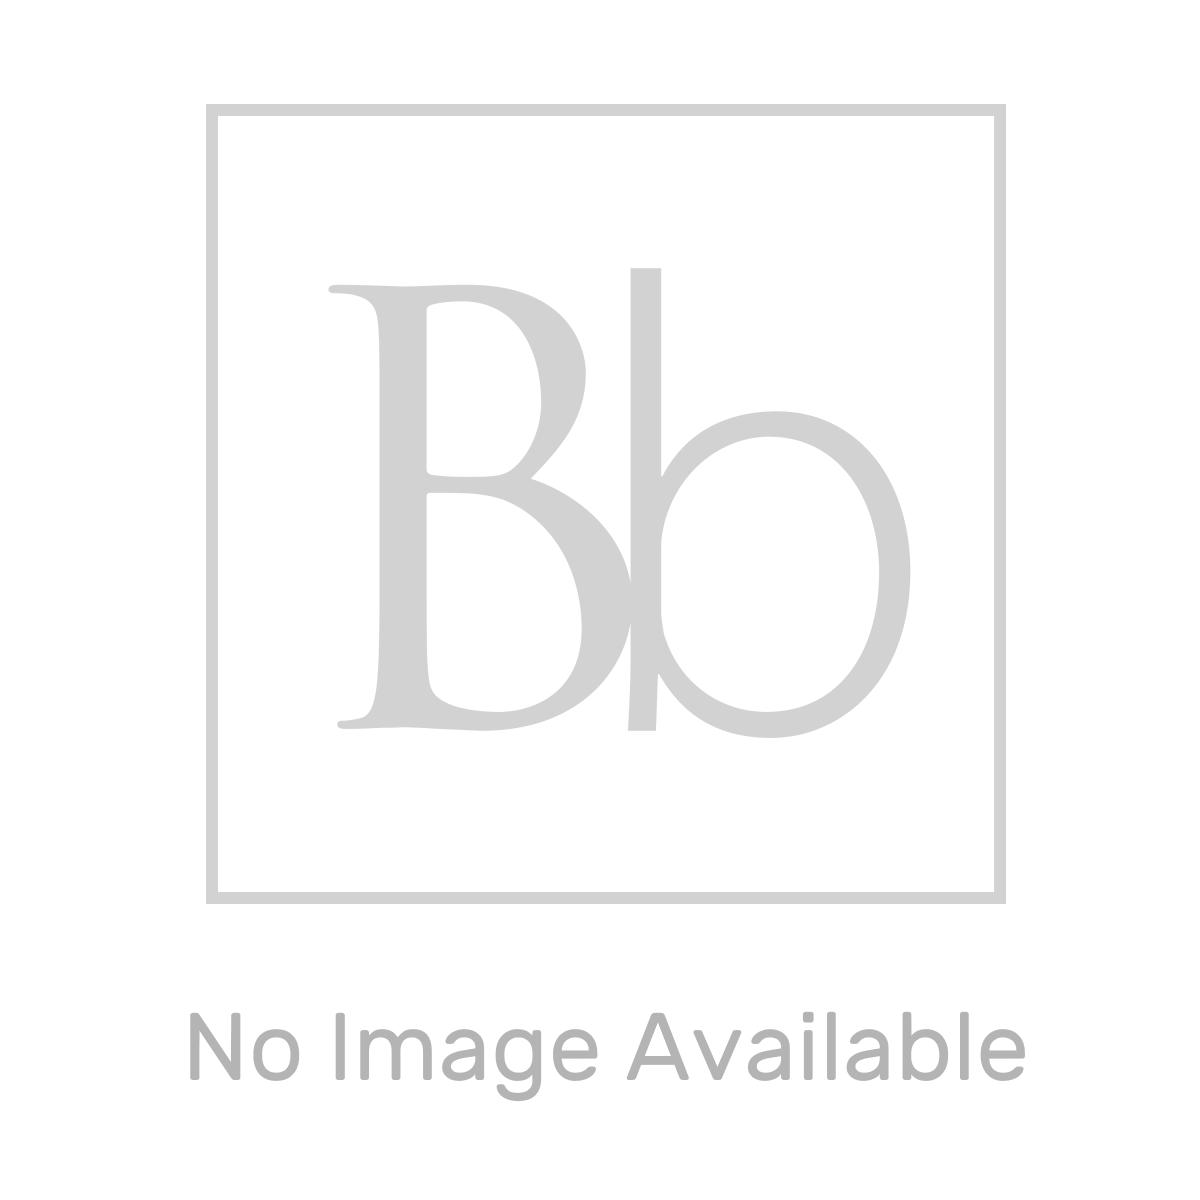 Tavistock Transmit LED Backlit Mirror Sensor